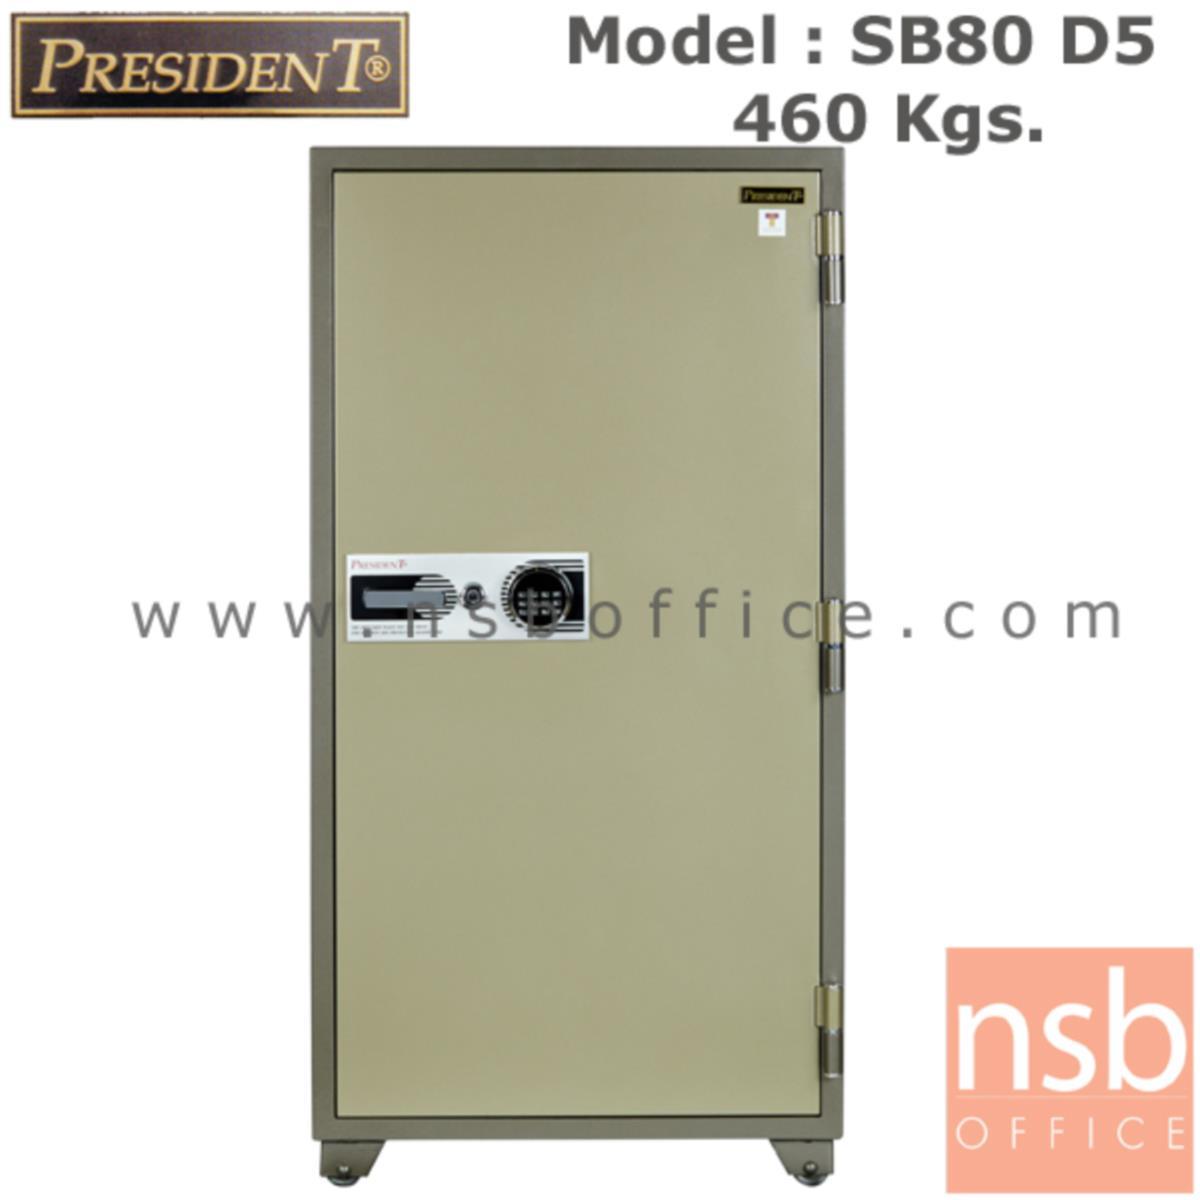 F05A066: ตู้เซฟนิรภัยชนิดดิจิตอลแบบใหม่ 460 กก. รุ่น PRESIDENT-SB80D5  มี 1 กุญแจ 1 รหัส (รหัสใช้กดหน้าตู้)